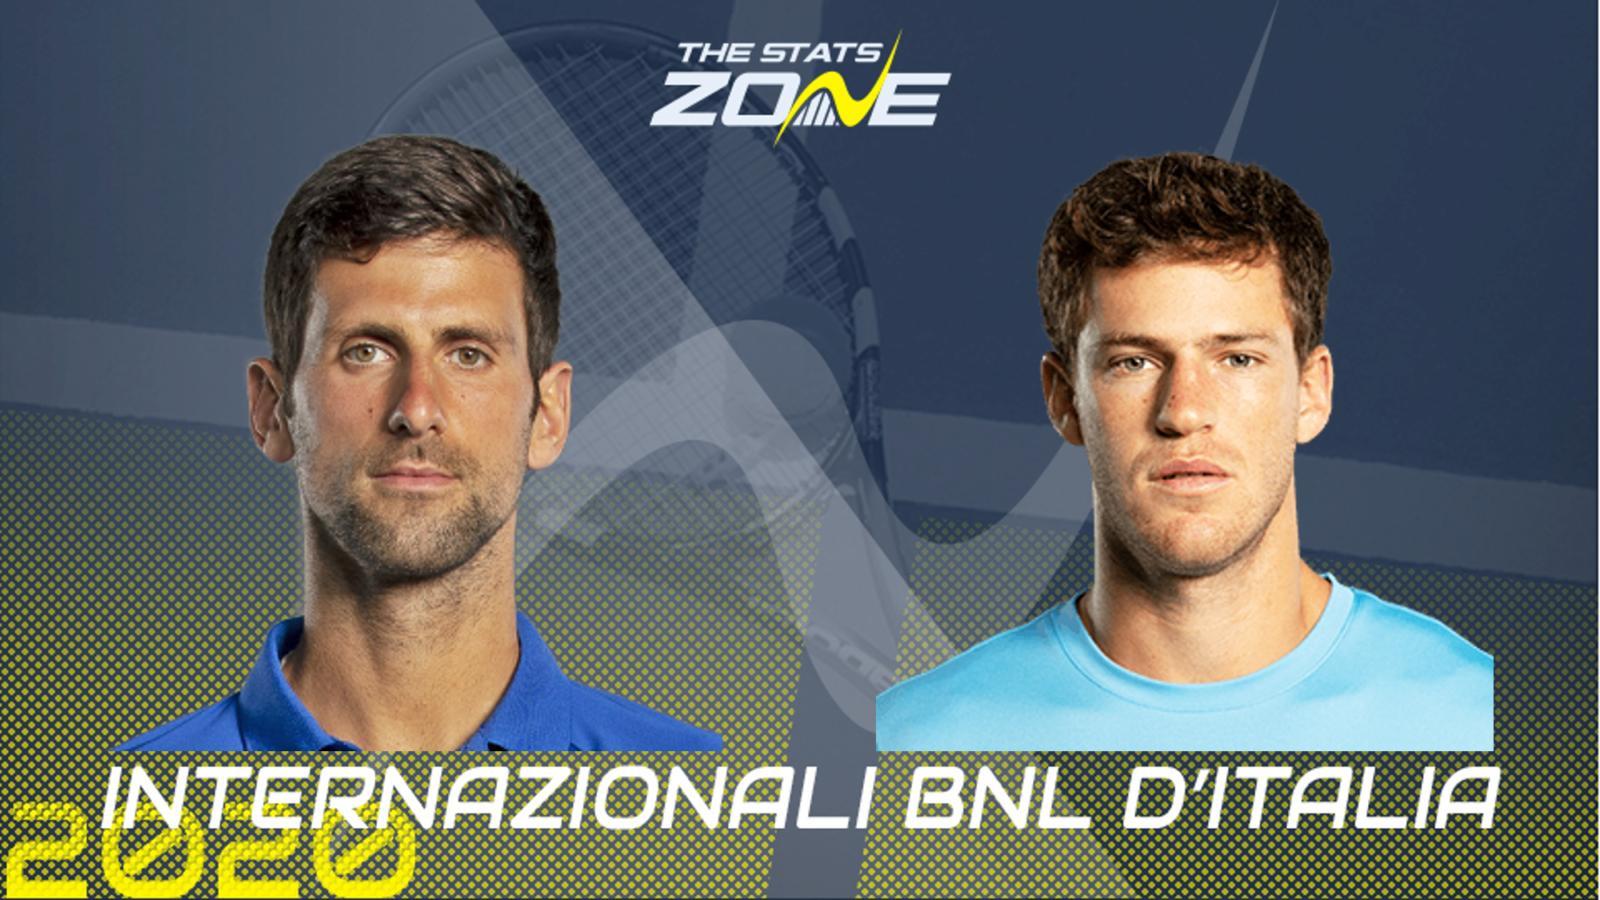 2020 Italian Open Final Novak Djokovic Vs Diego Schwartzman Preview Prediction The Stats Zone